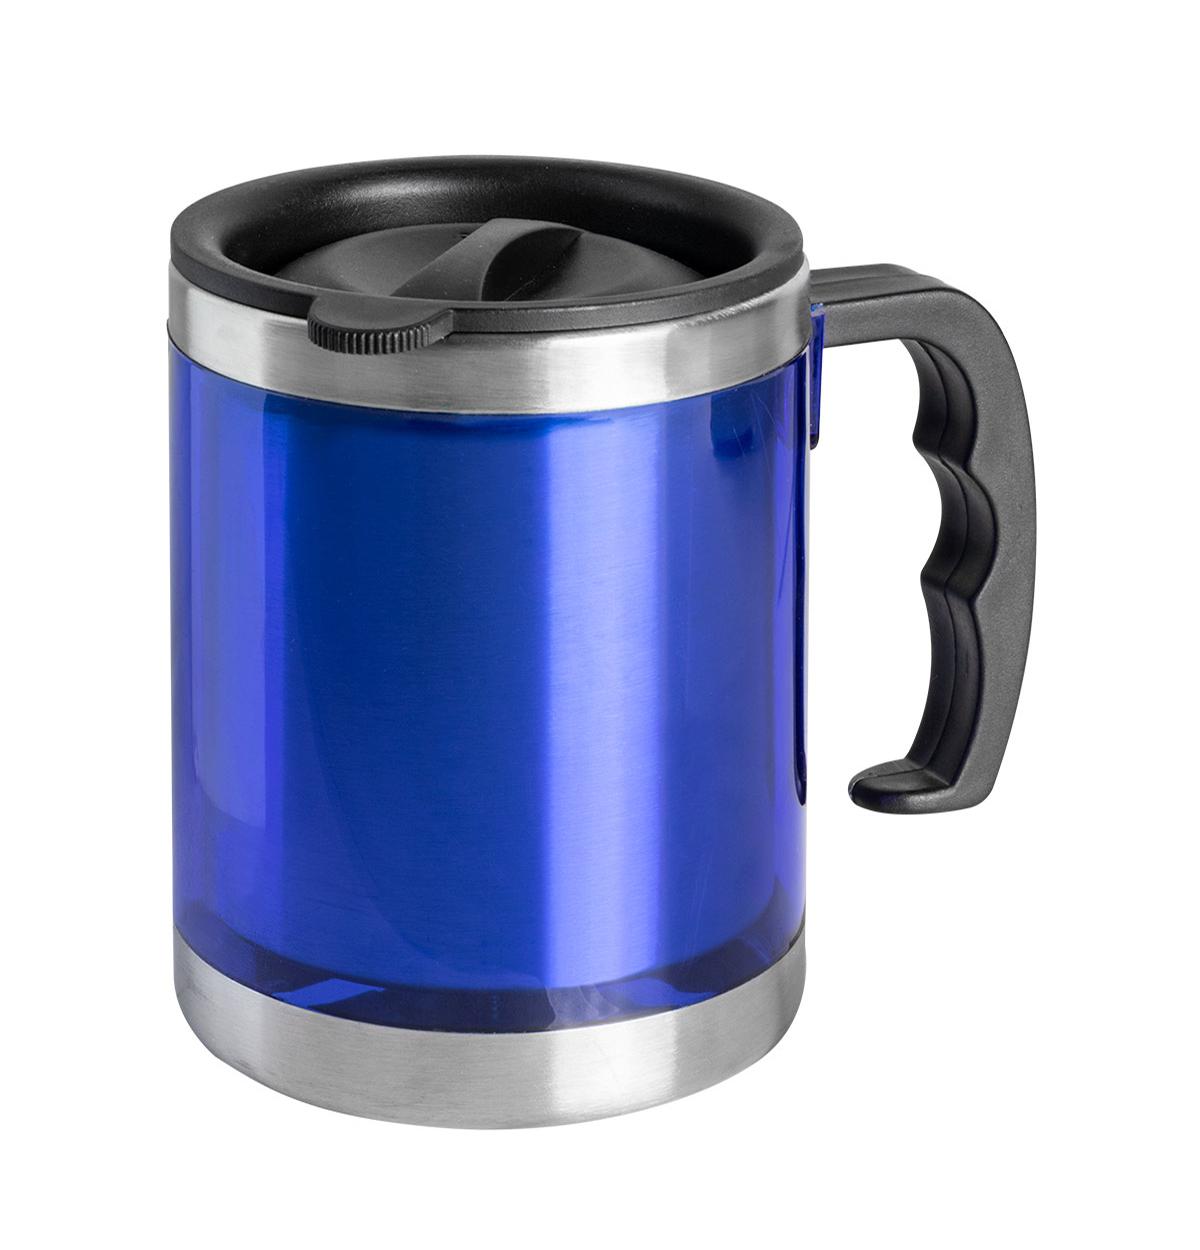 COFFEE THERMO MUG